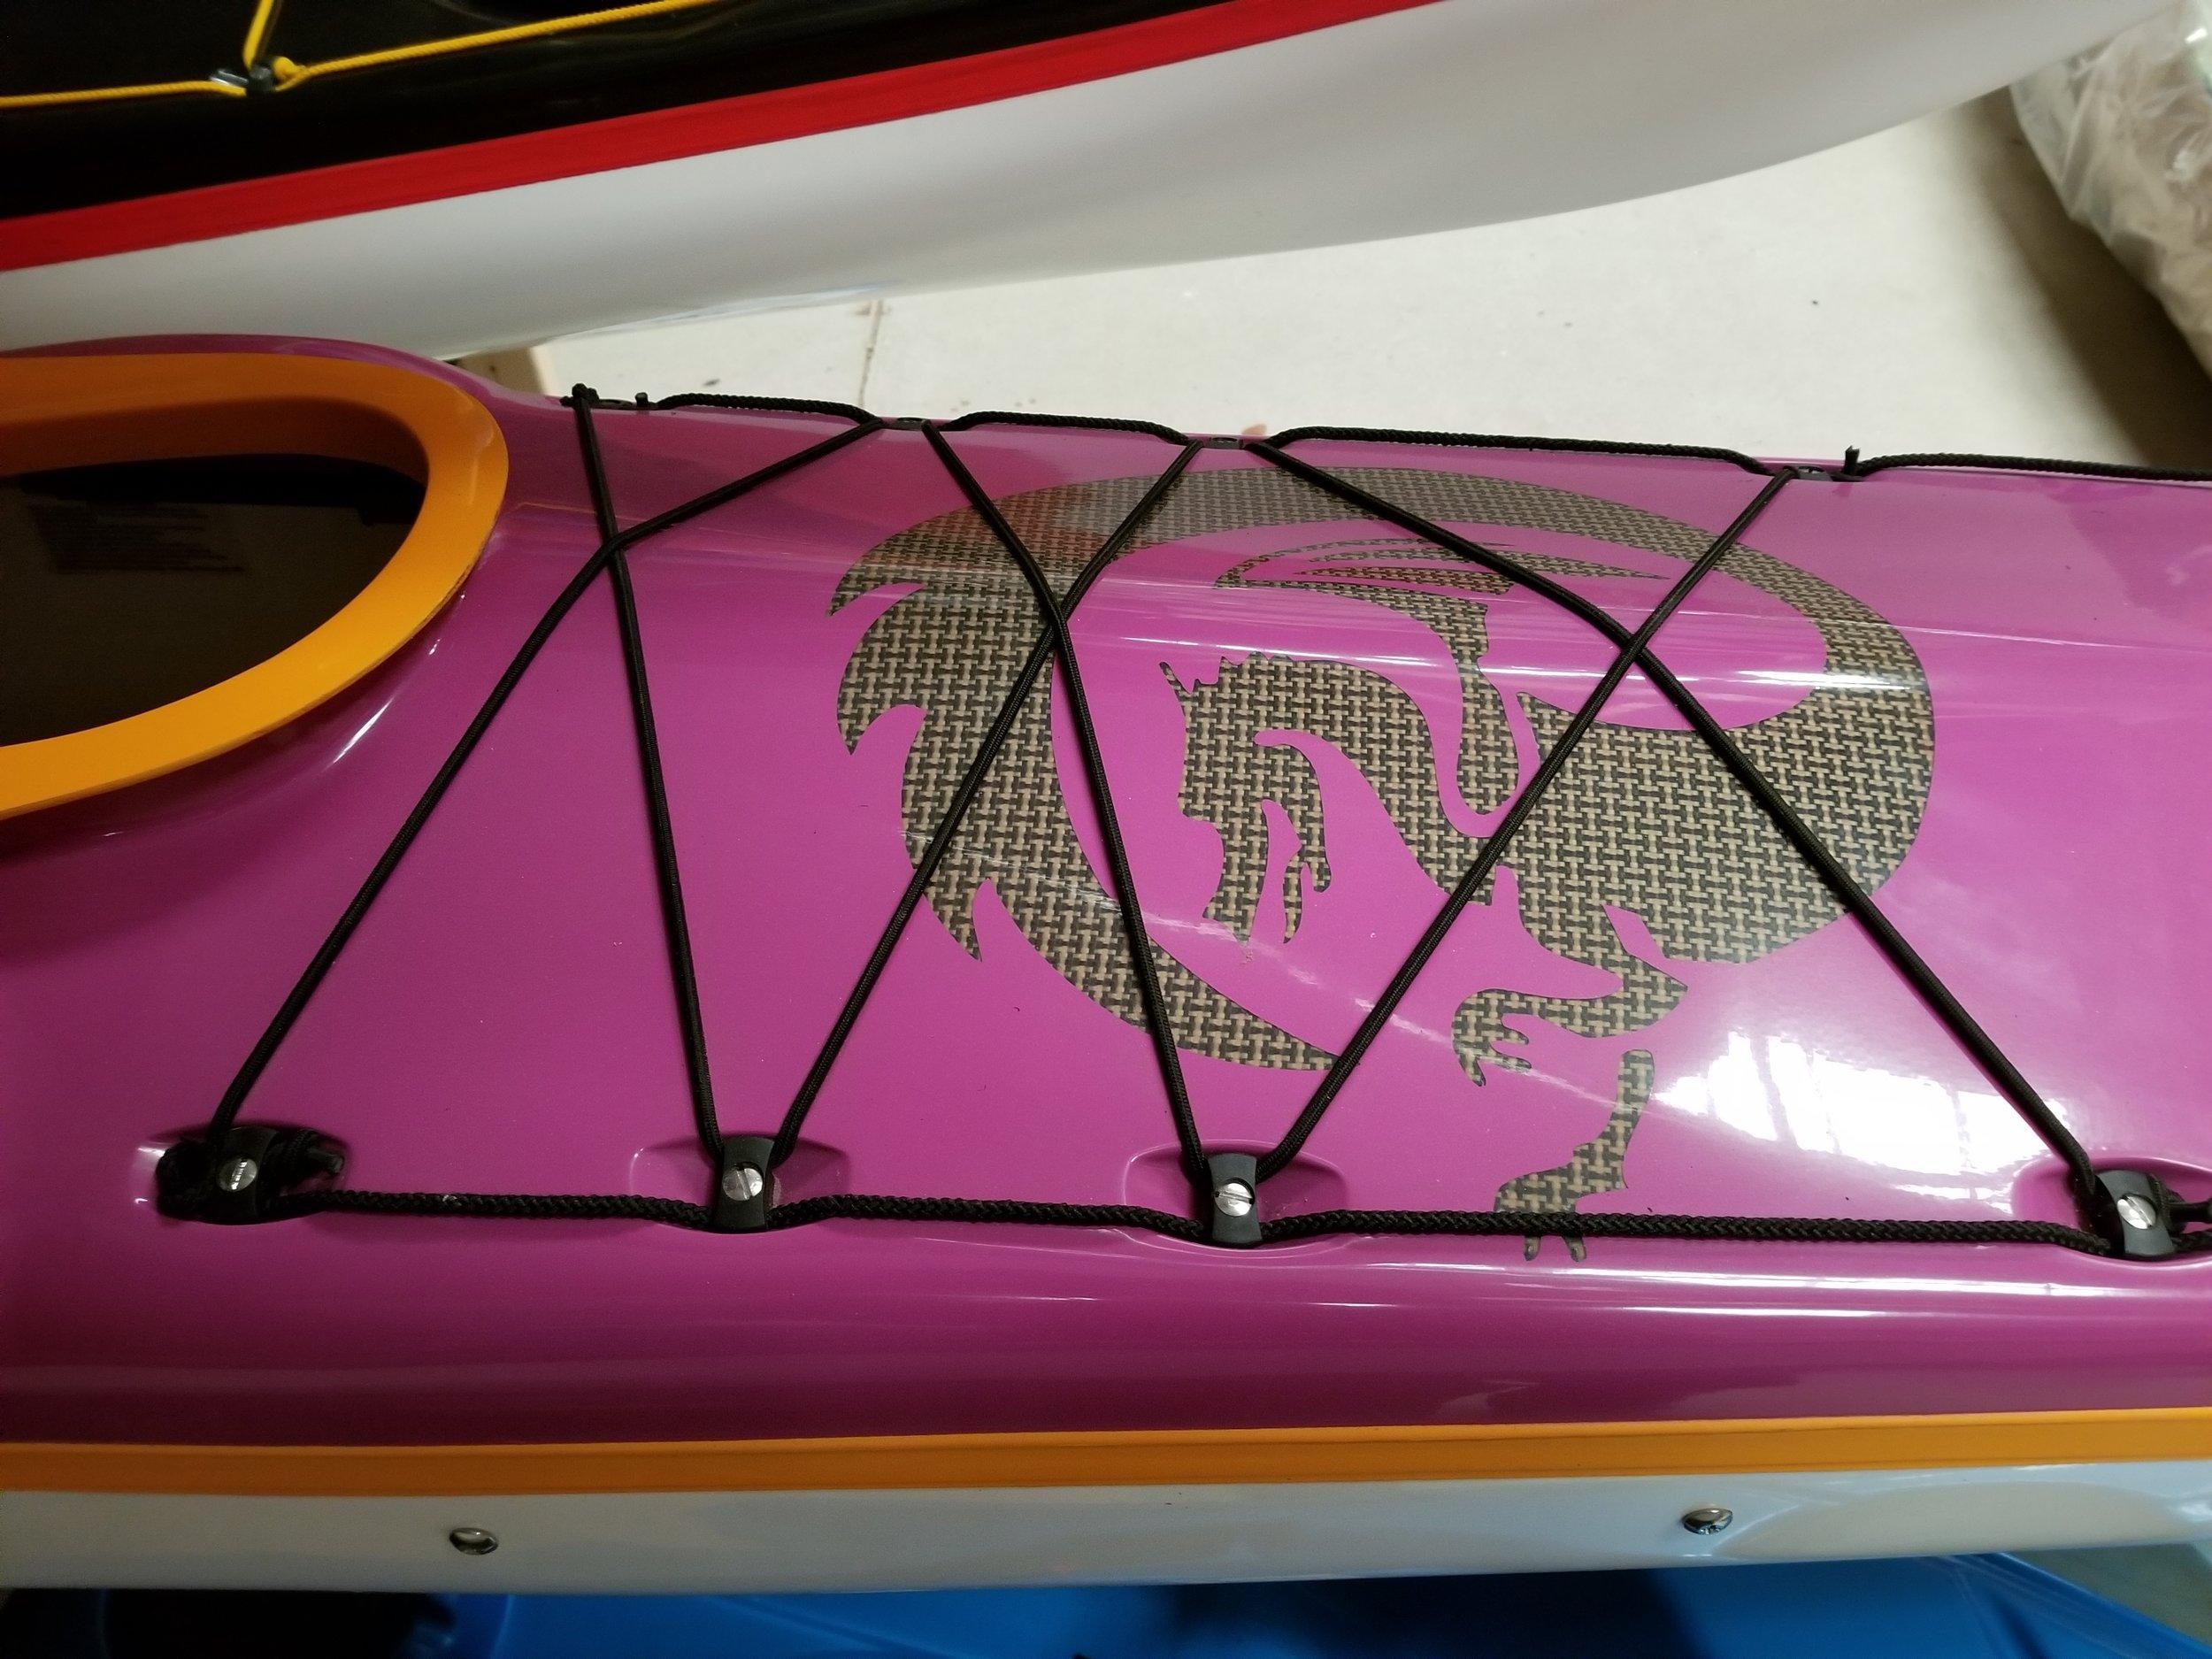 Regular volume.  50/50 layup. Long cockpit, custom bulkhead. Purple deck, white hull,mango combing and seam, clear logo (carbon/kevlar cloth visible).  2016